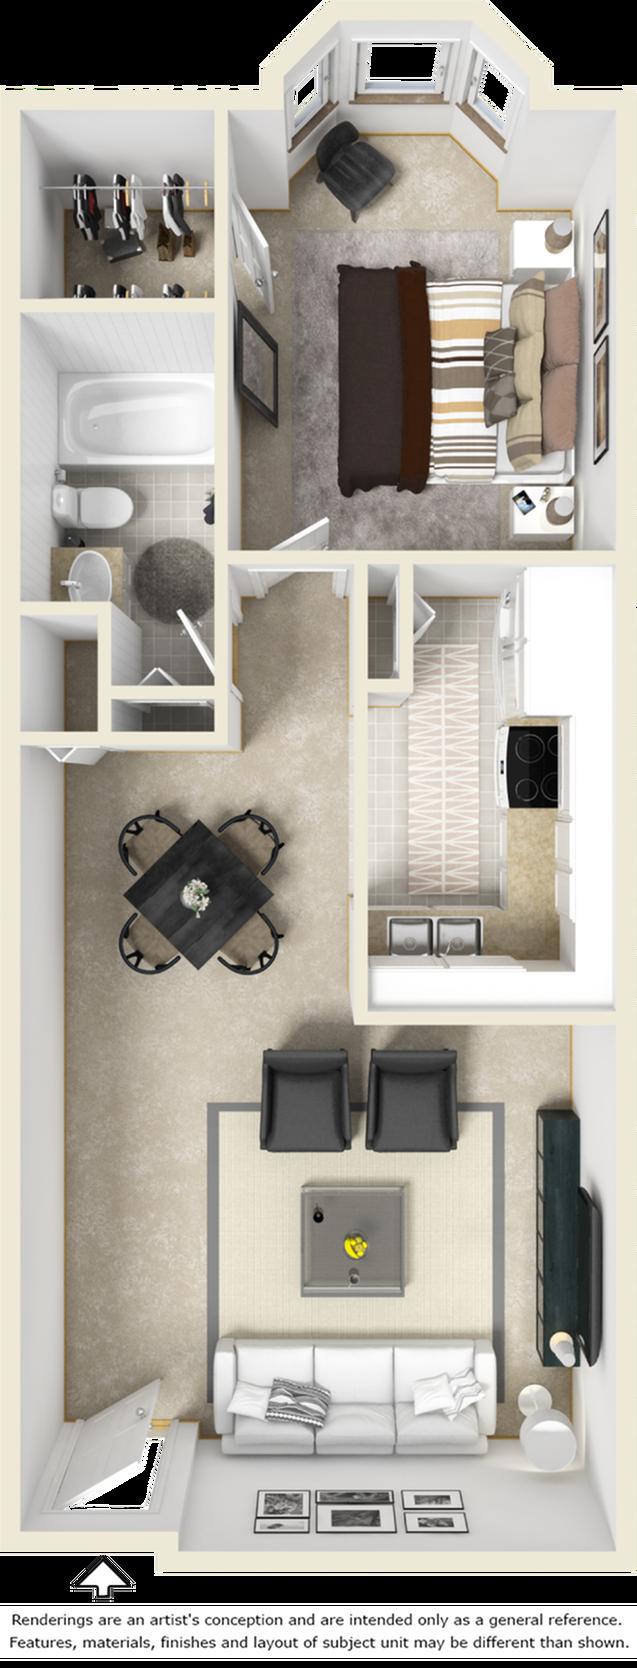 Sutton 1 bedroom 1 bathroom floor plan